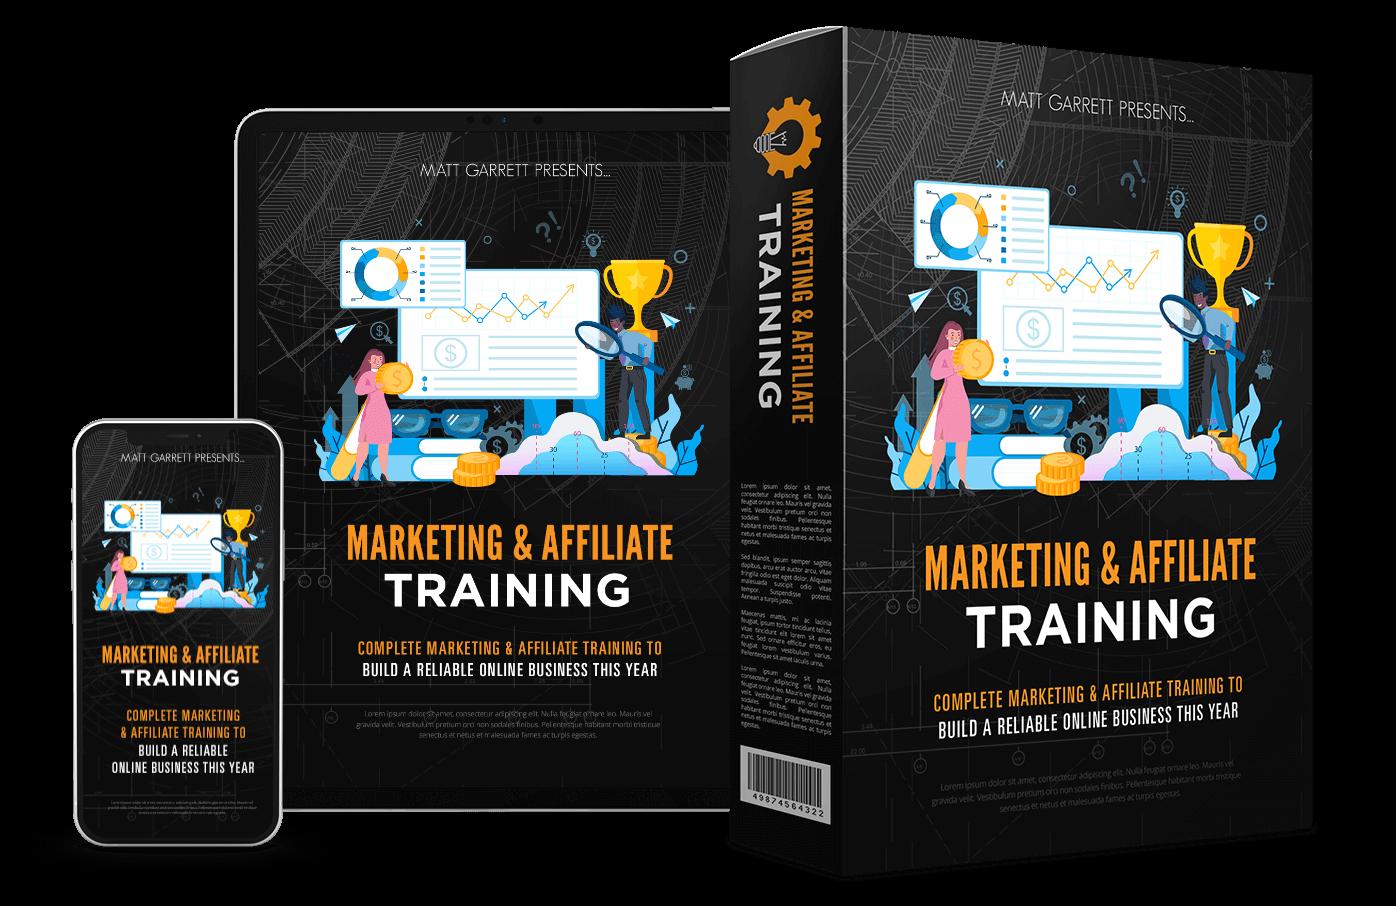 MAT1-Marketing-Affiliate-Training-review